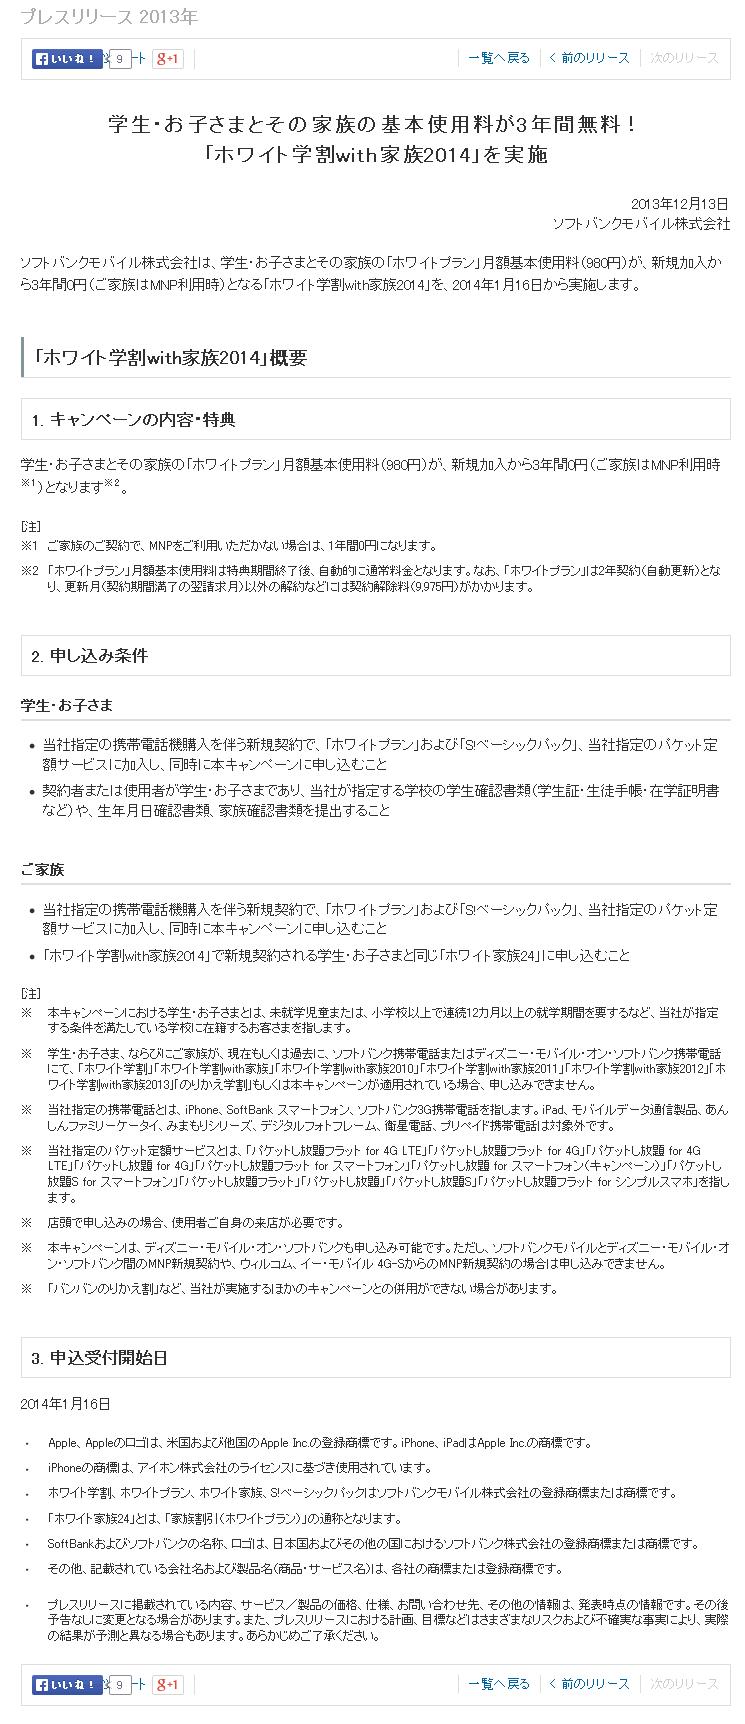 softbank_gakuwari2014